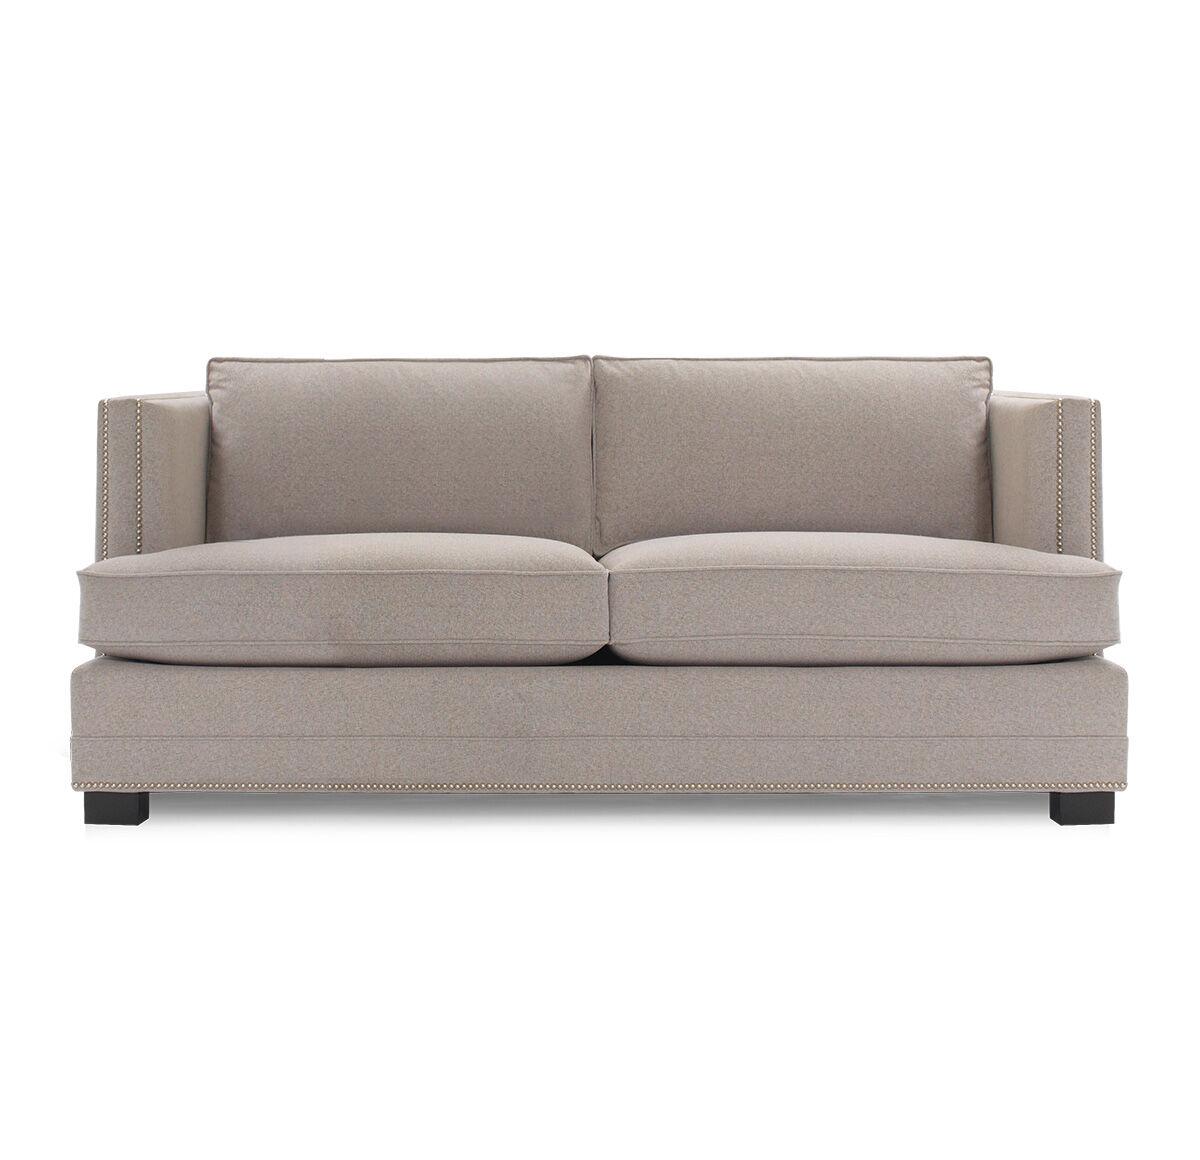 Bobs Furniture Sleeper Sofa #34: KEATON LUXE QUEEN SLEEPER, FULMER - TAUPE, Hi-res